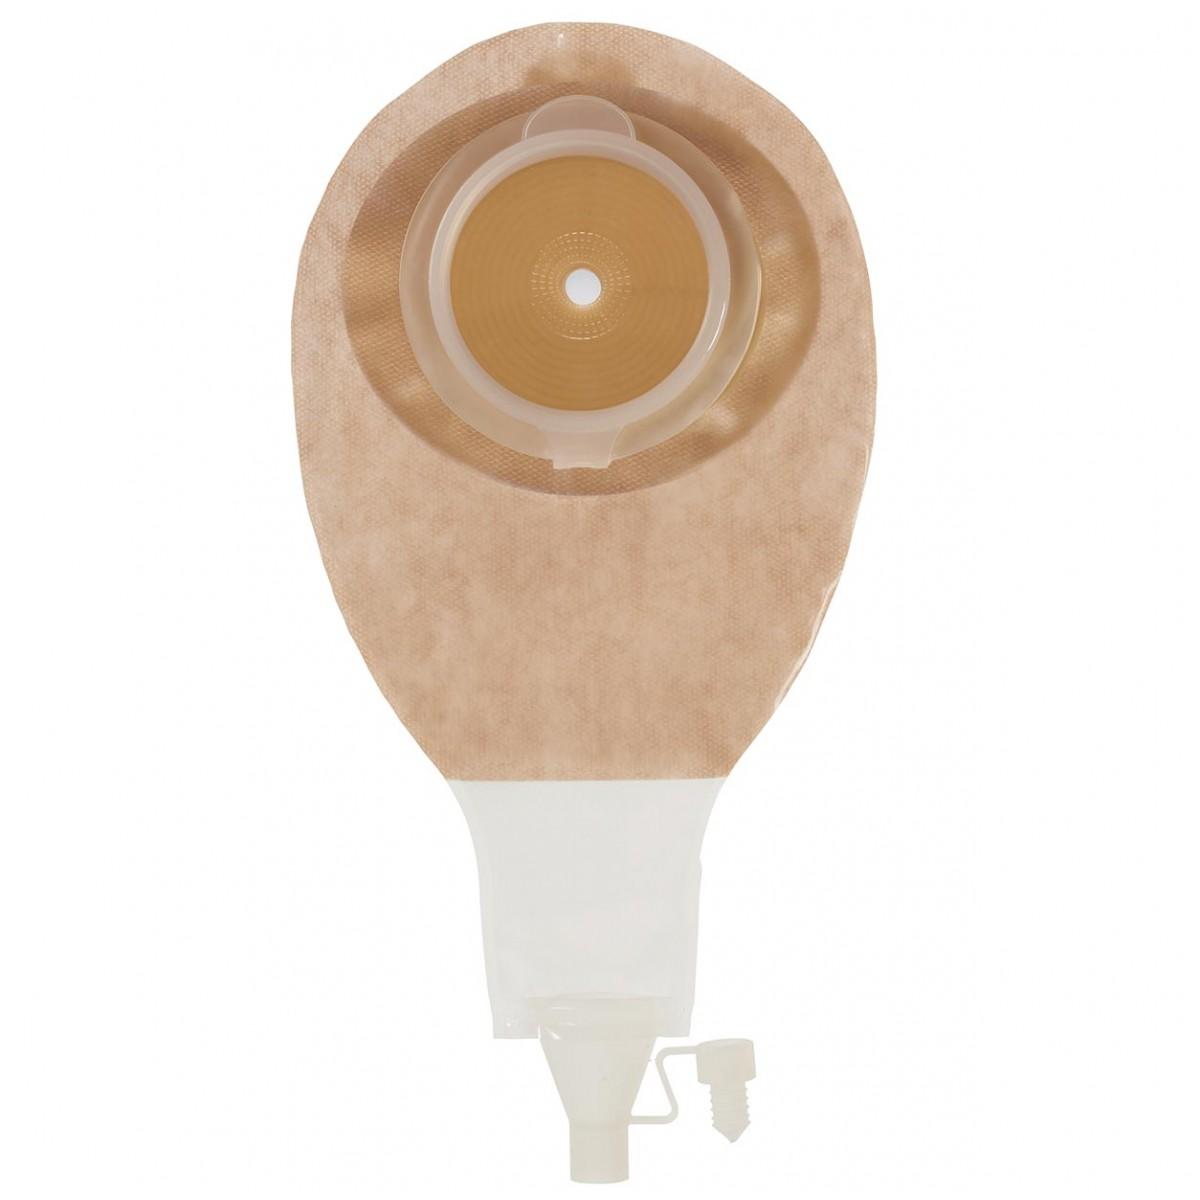 Bolsa 10-115mm Dren Transp Sensura Pos-Op 19021  - (Coloplast)